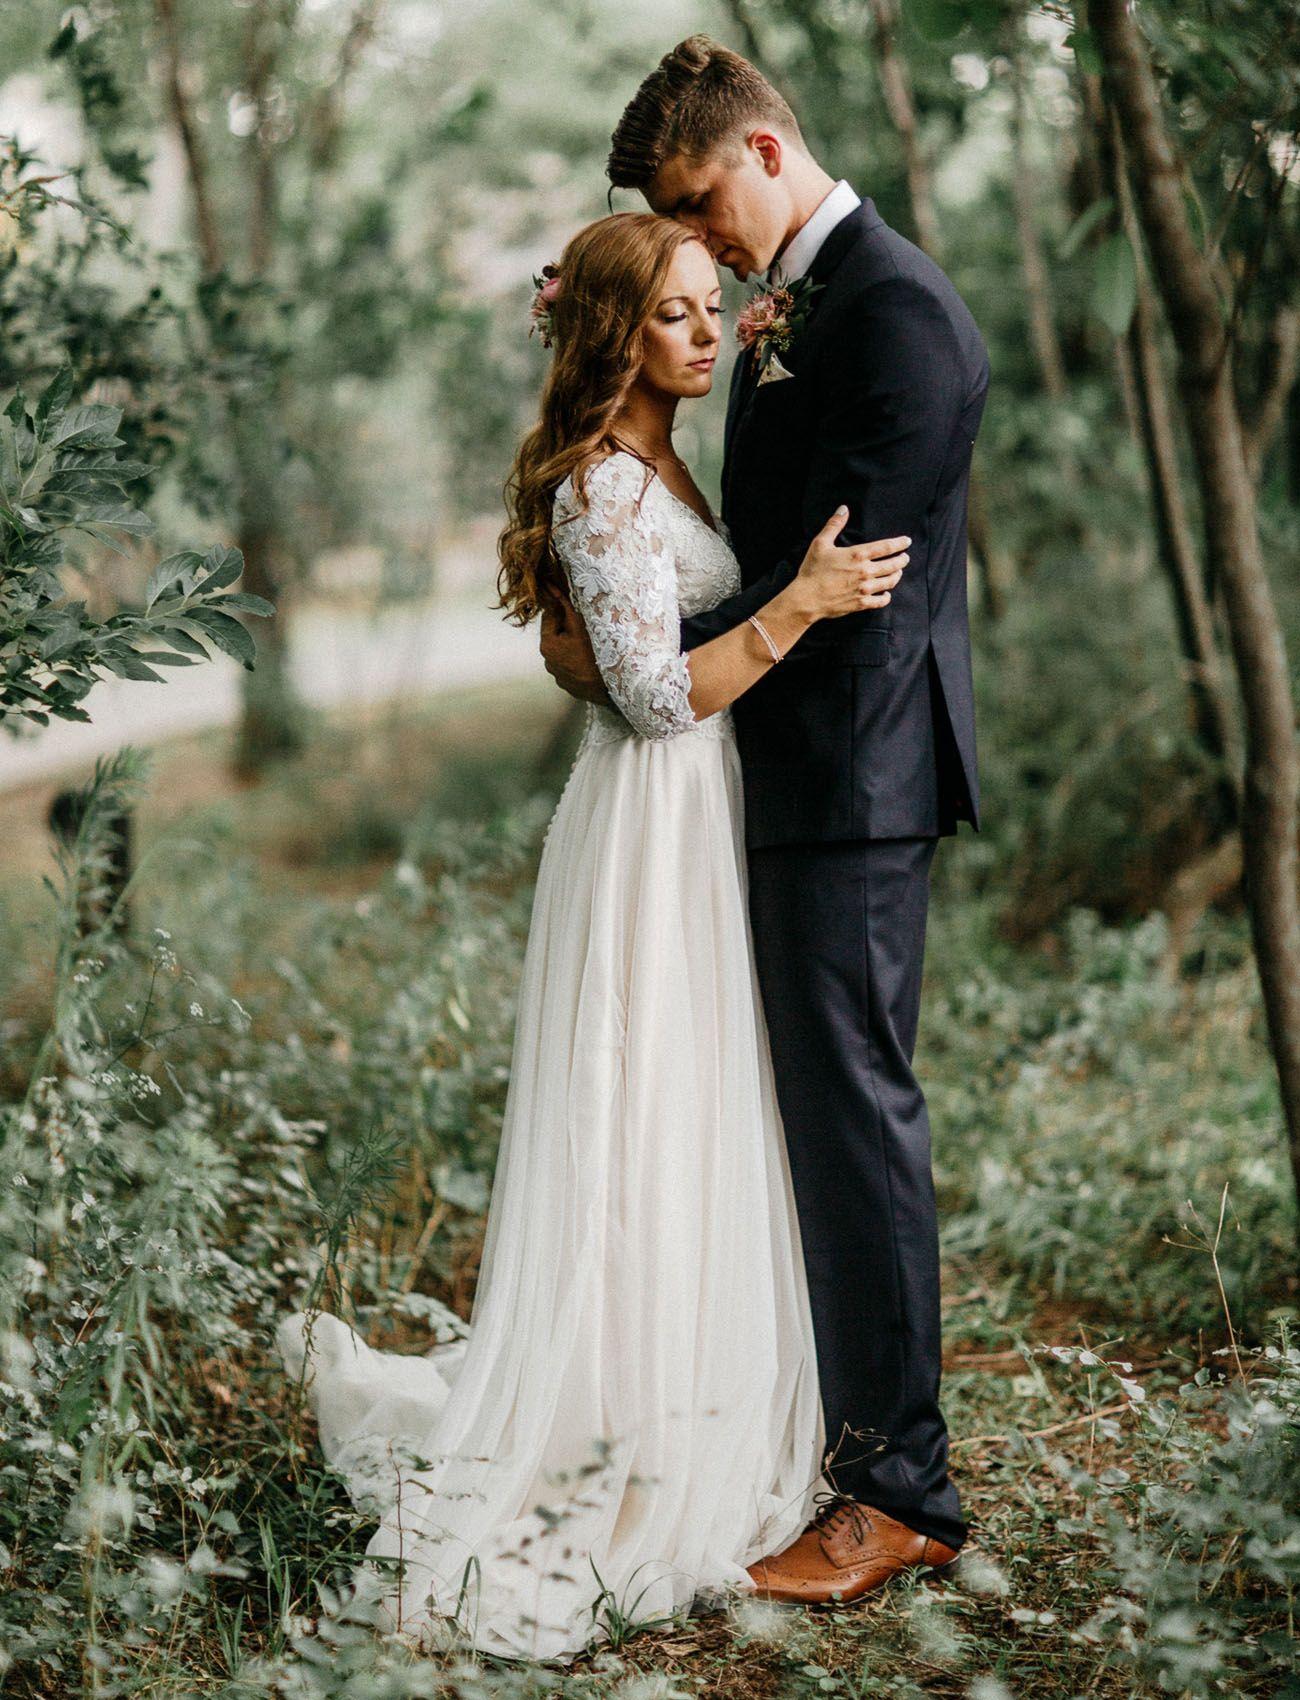 Enchanted forest wedding in oklahoma peyton colton wedding